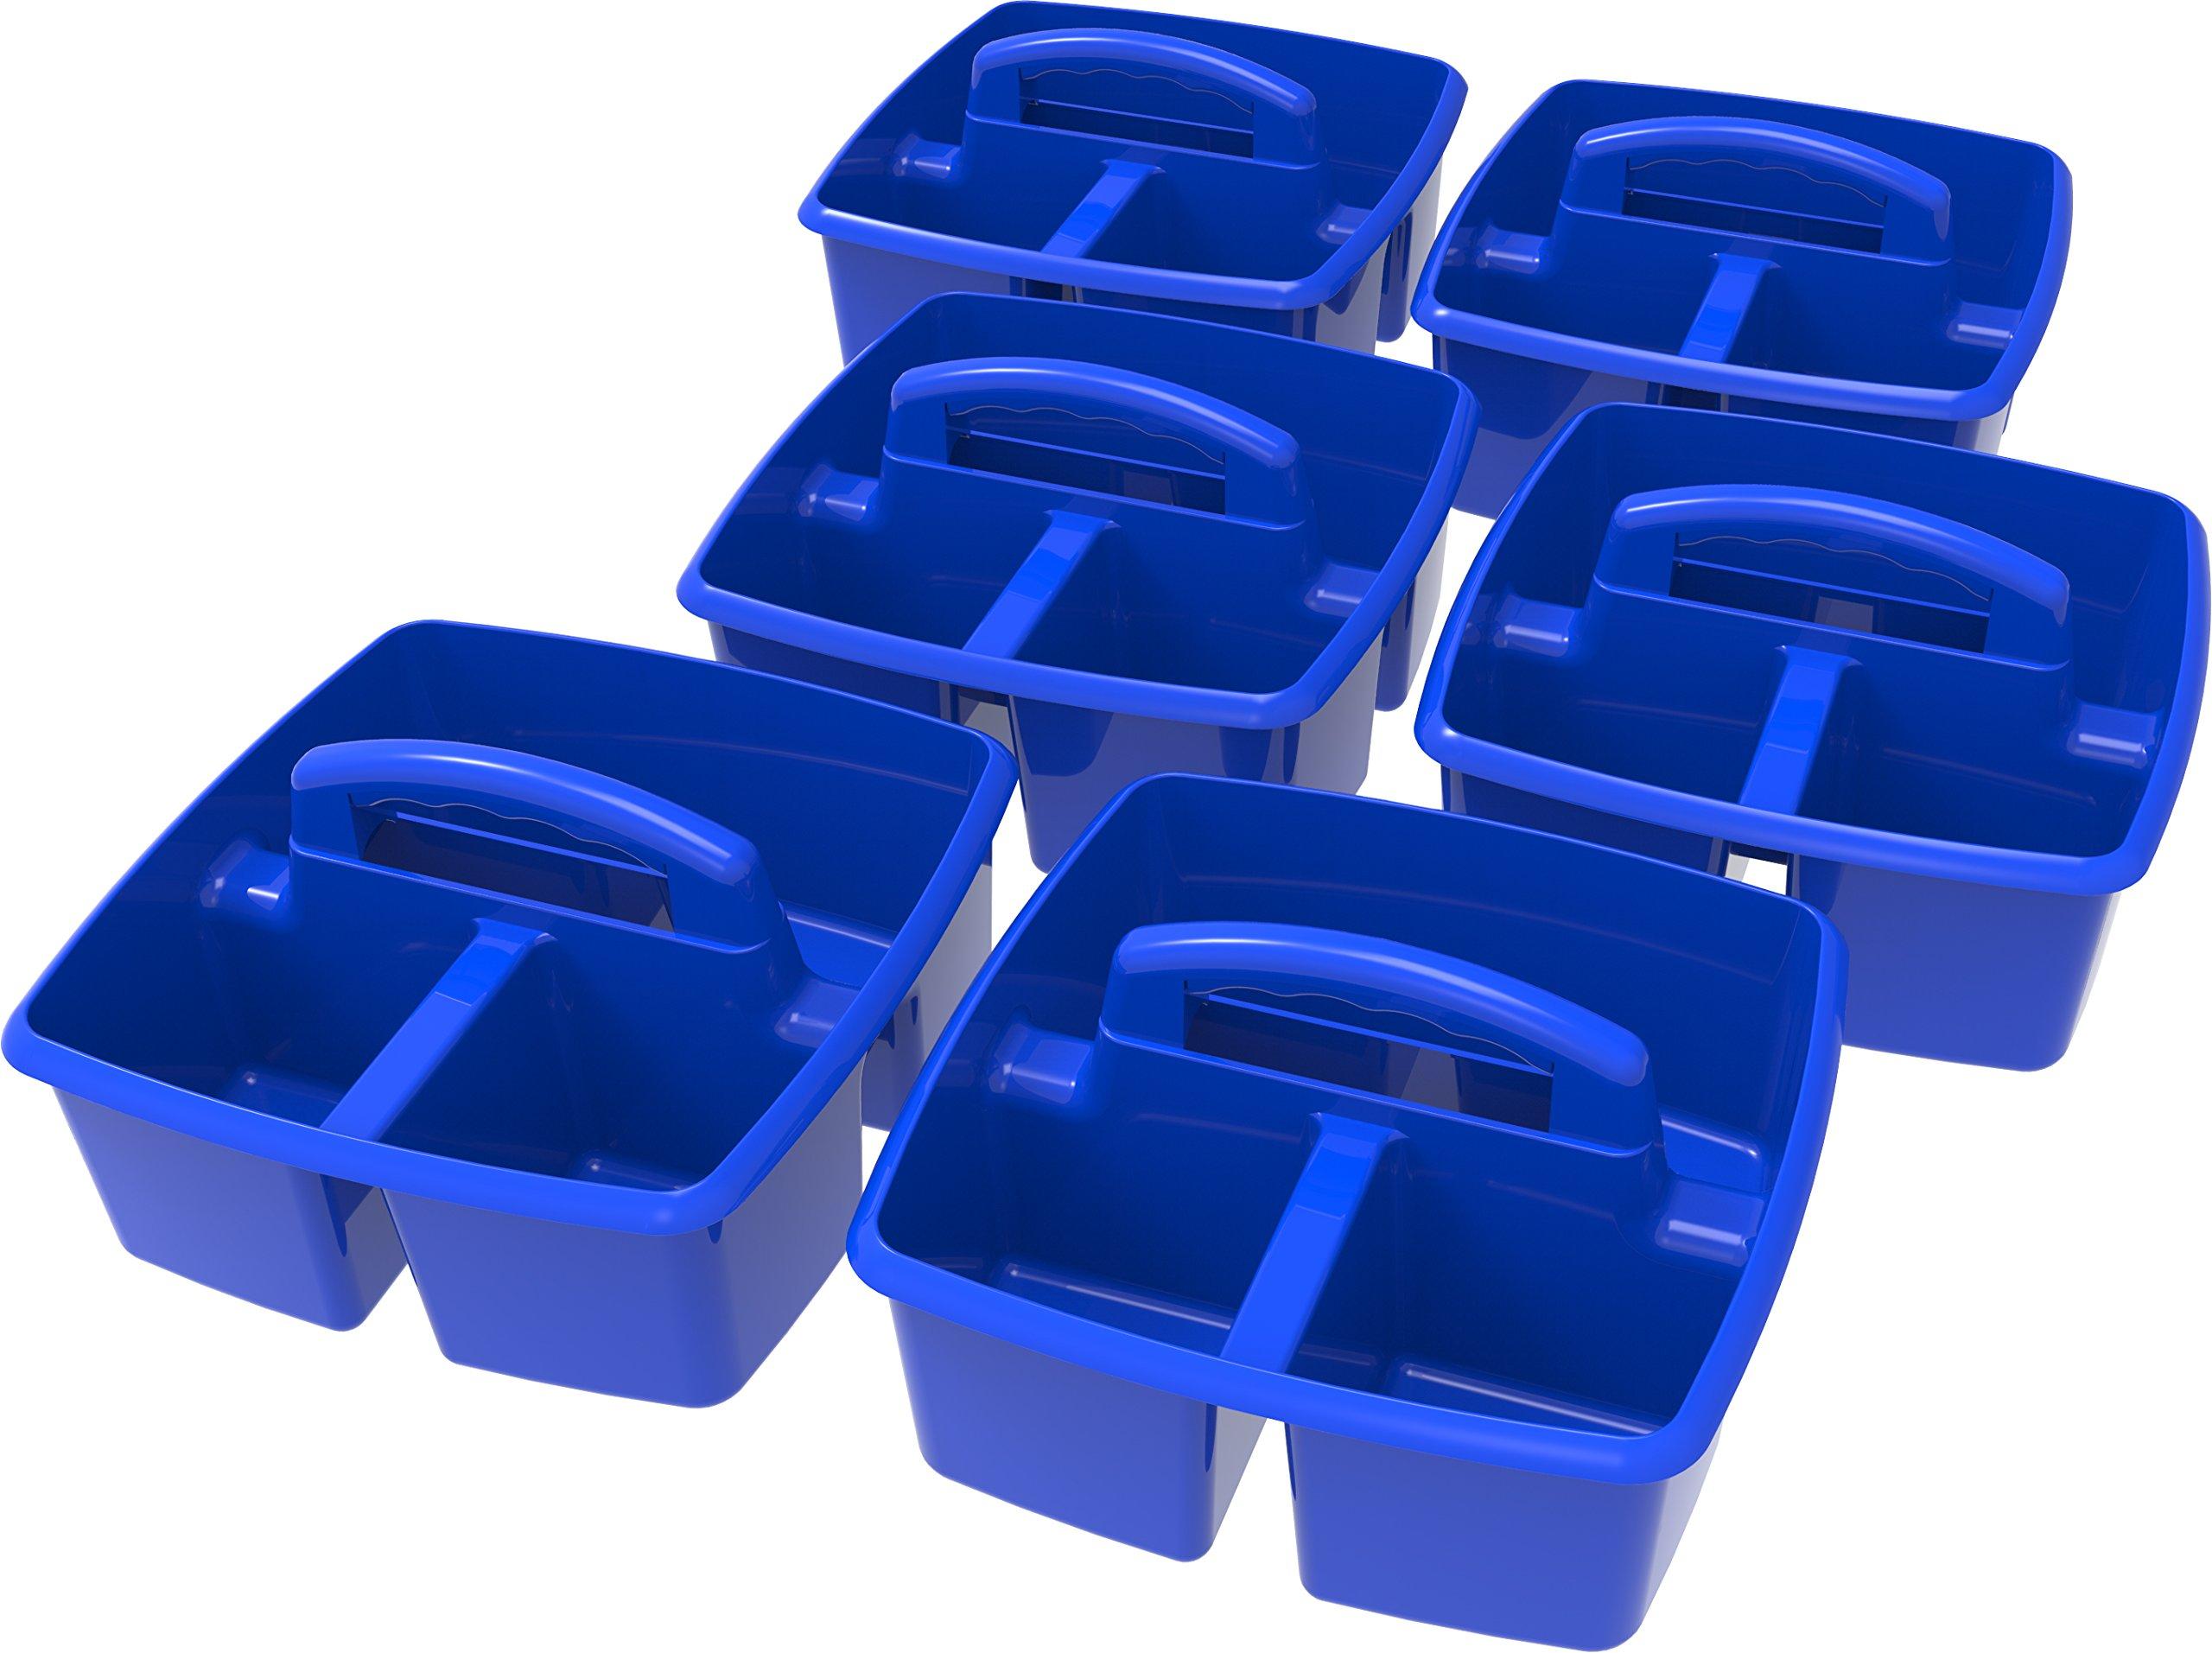 Storex Classroom Caddy, 9.25 x 9.25 x 5.25'', Blue, Case of 6 (00947E06C)